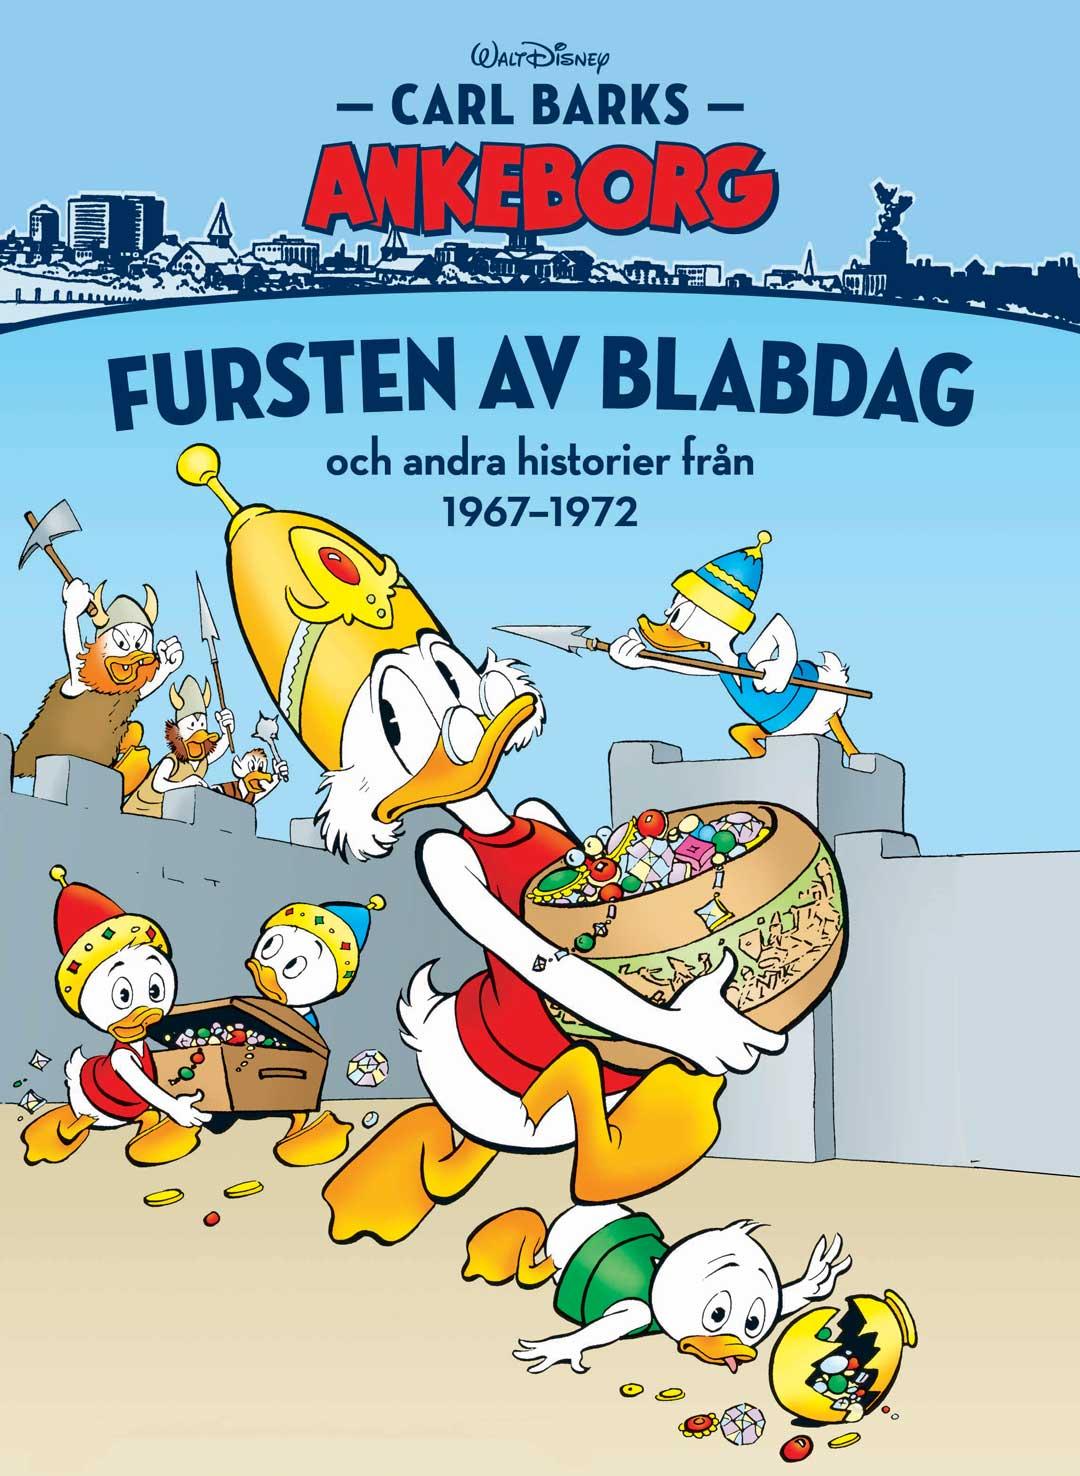 Carl Barks Ankeborg 29